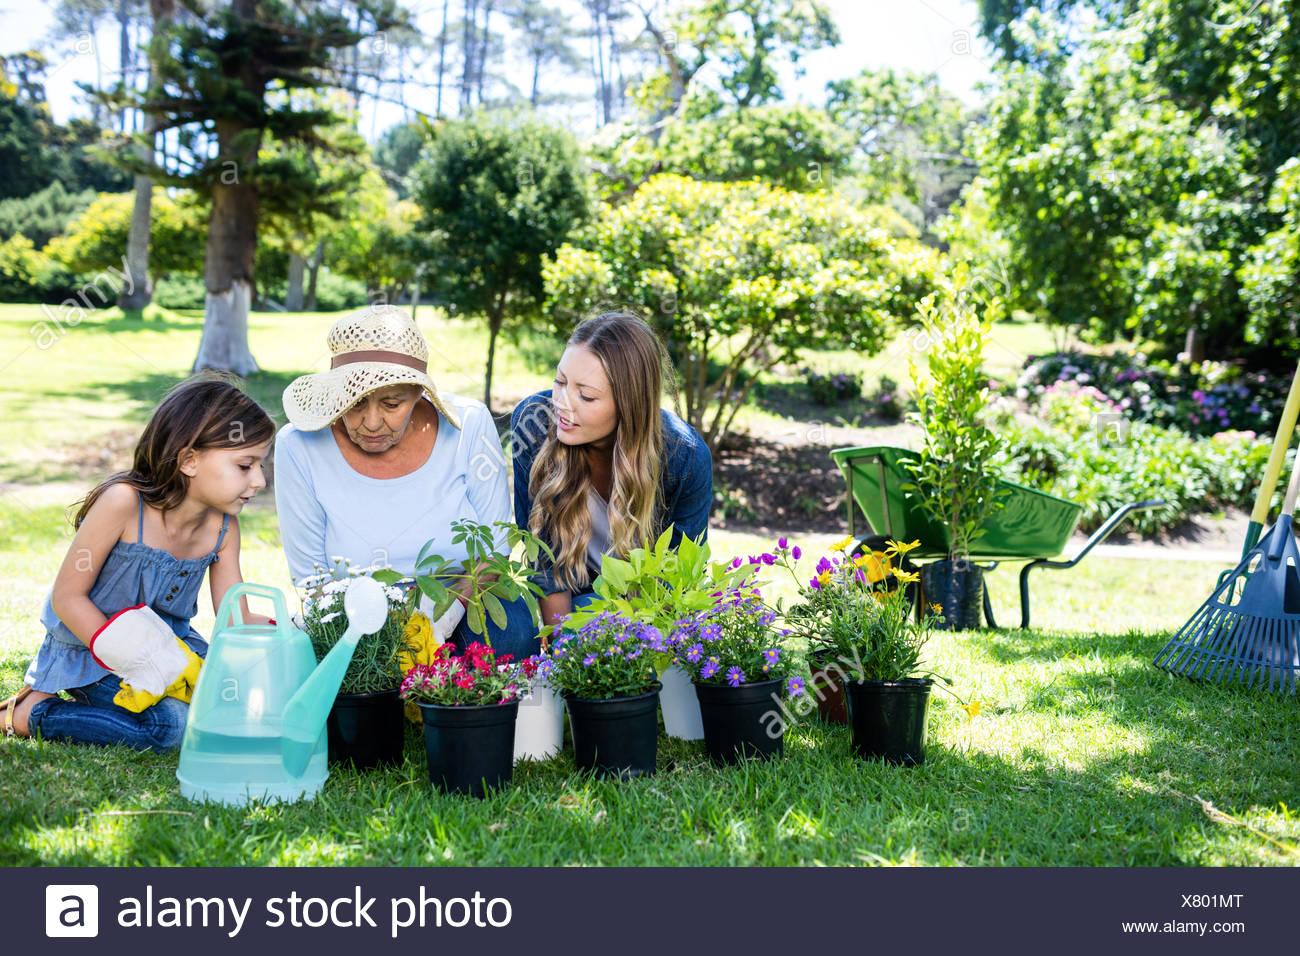 Multi-generation family gardening in the park - Stock Image